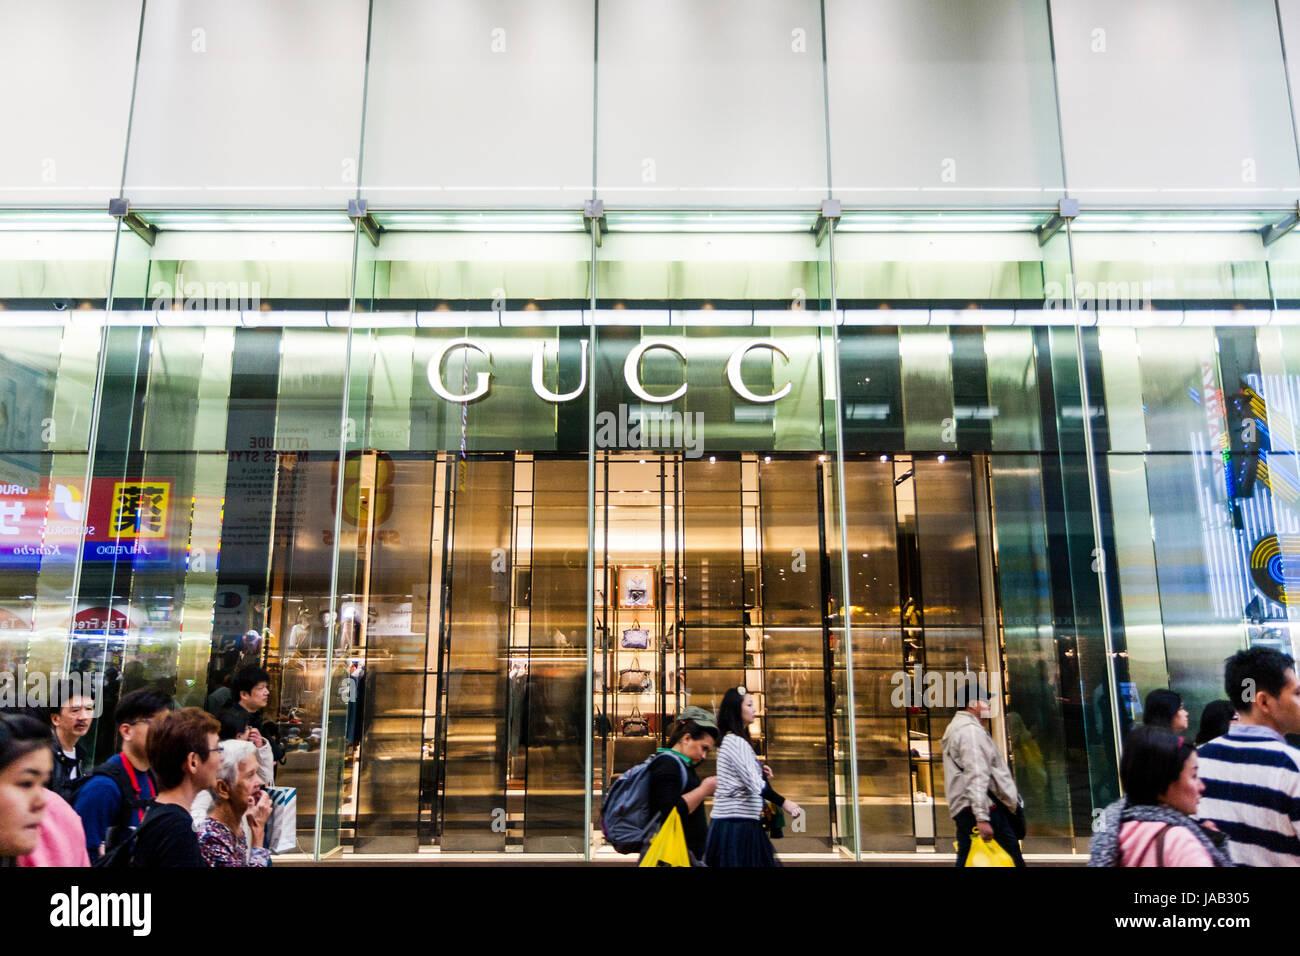 Japan, Osaka, Shinsaibashi. Gucci fashion store front. Green tinted glass with name above entrance. People walking - Stock Image